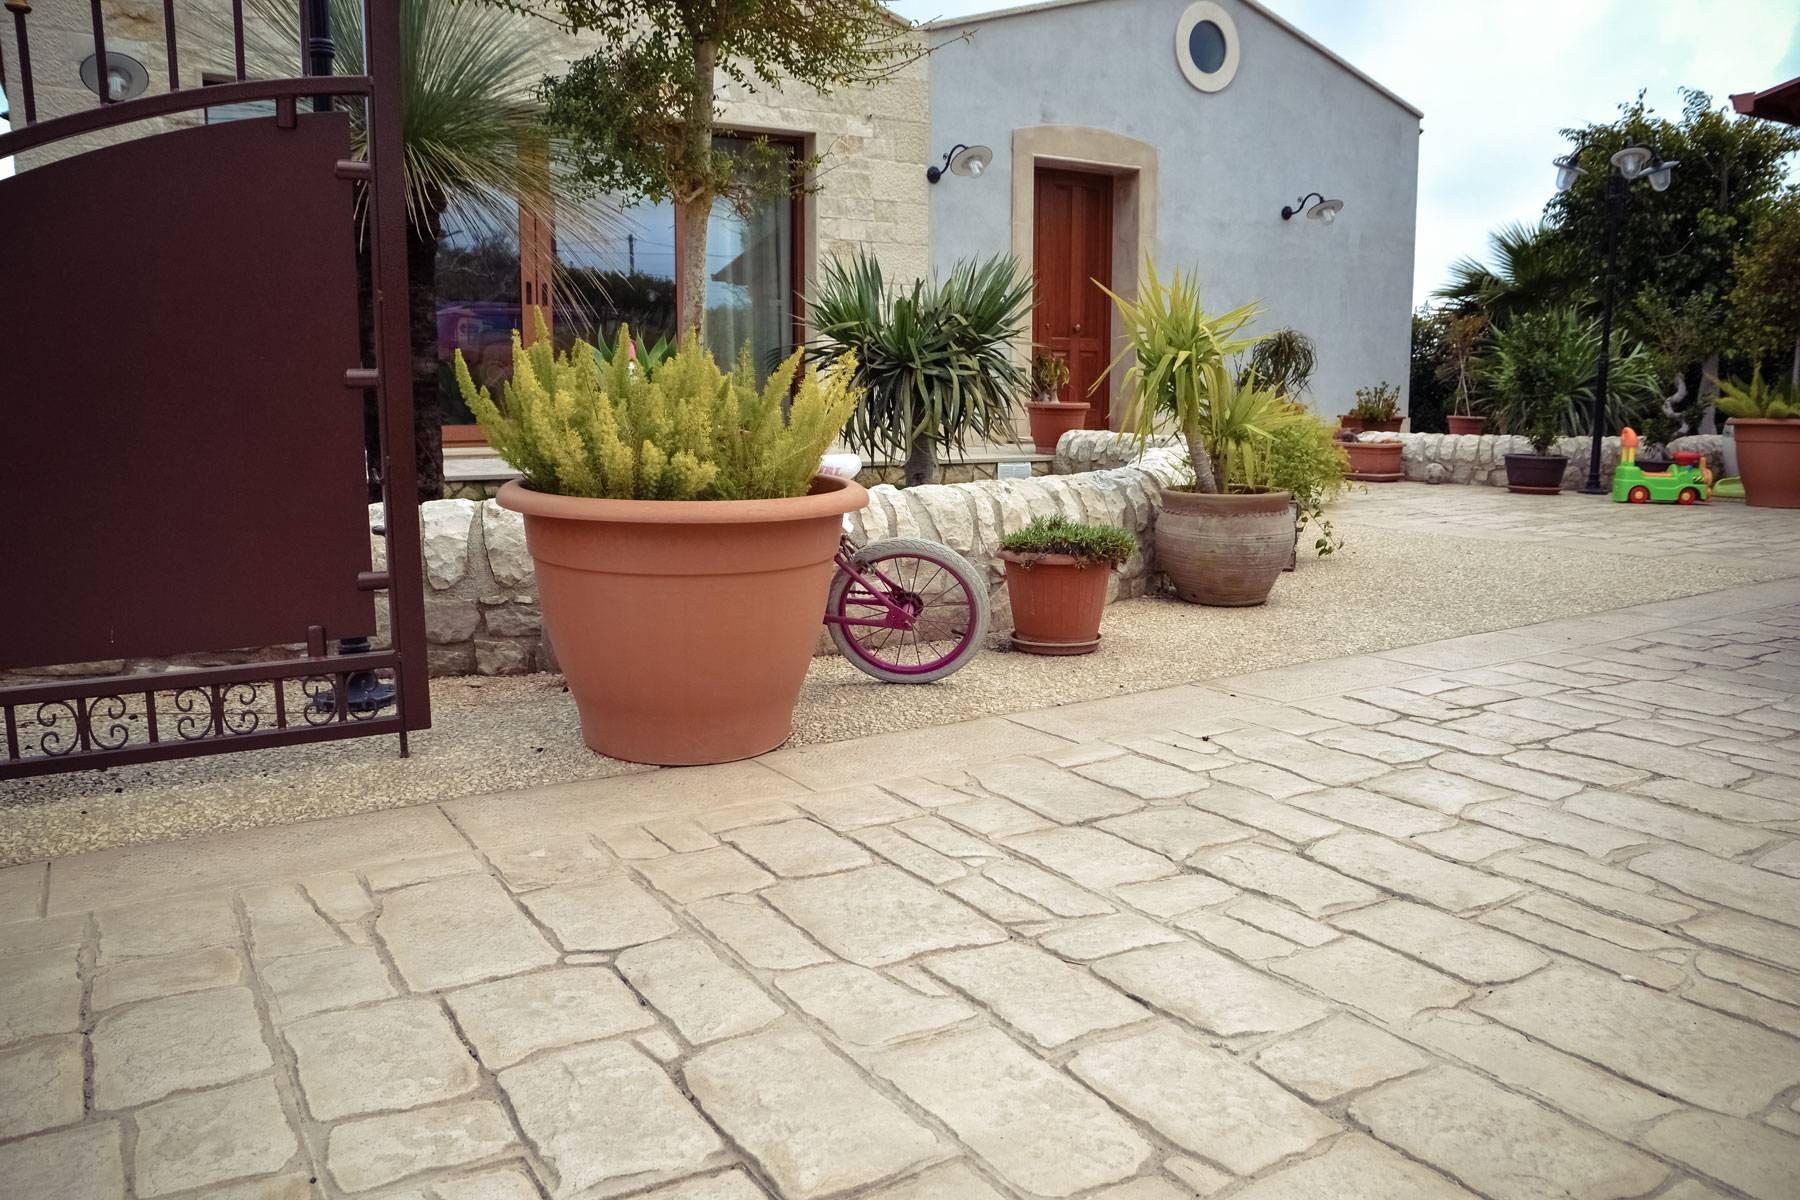 12 ingresso con giardino / Basole modicane e Ghiaia a Vista / Color pietra